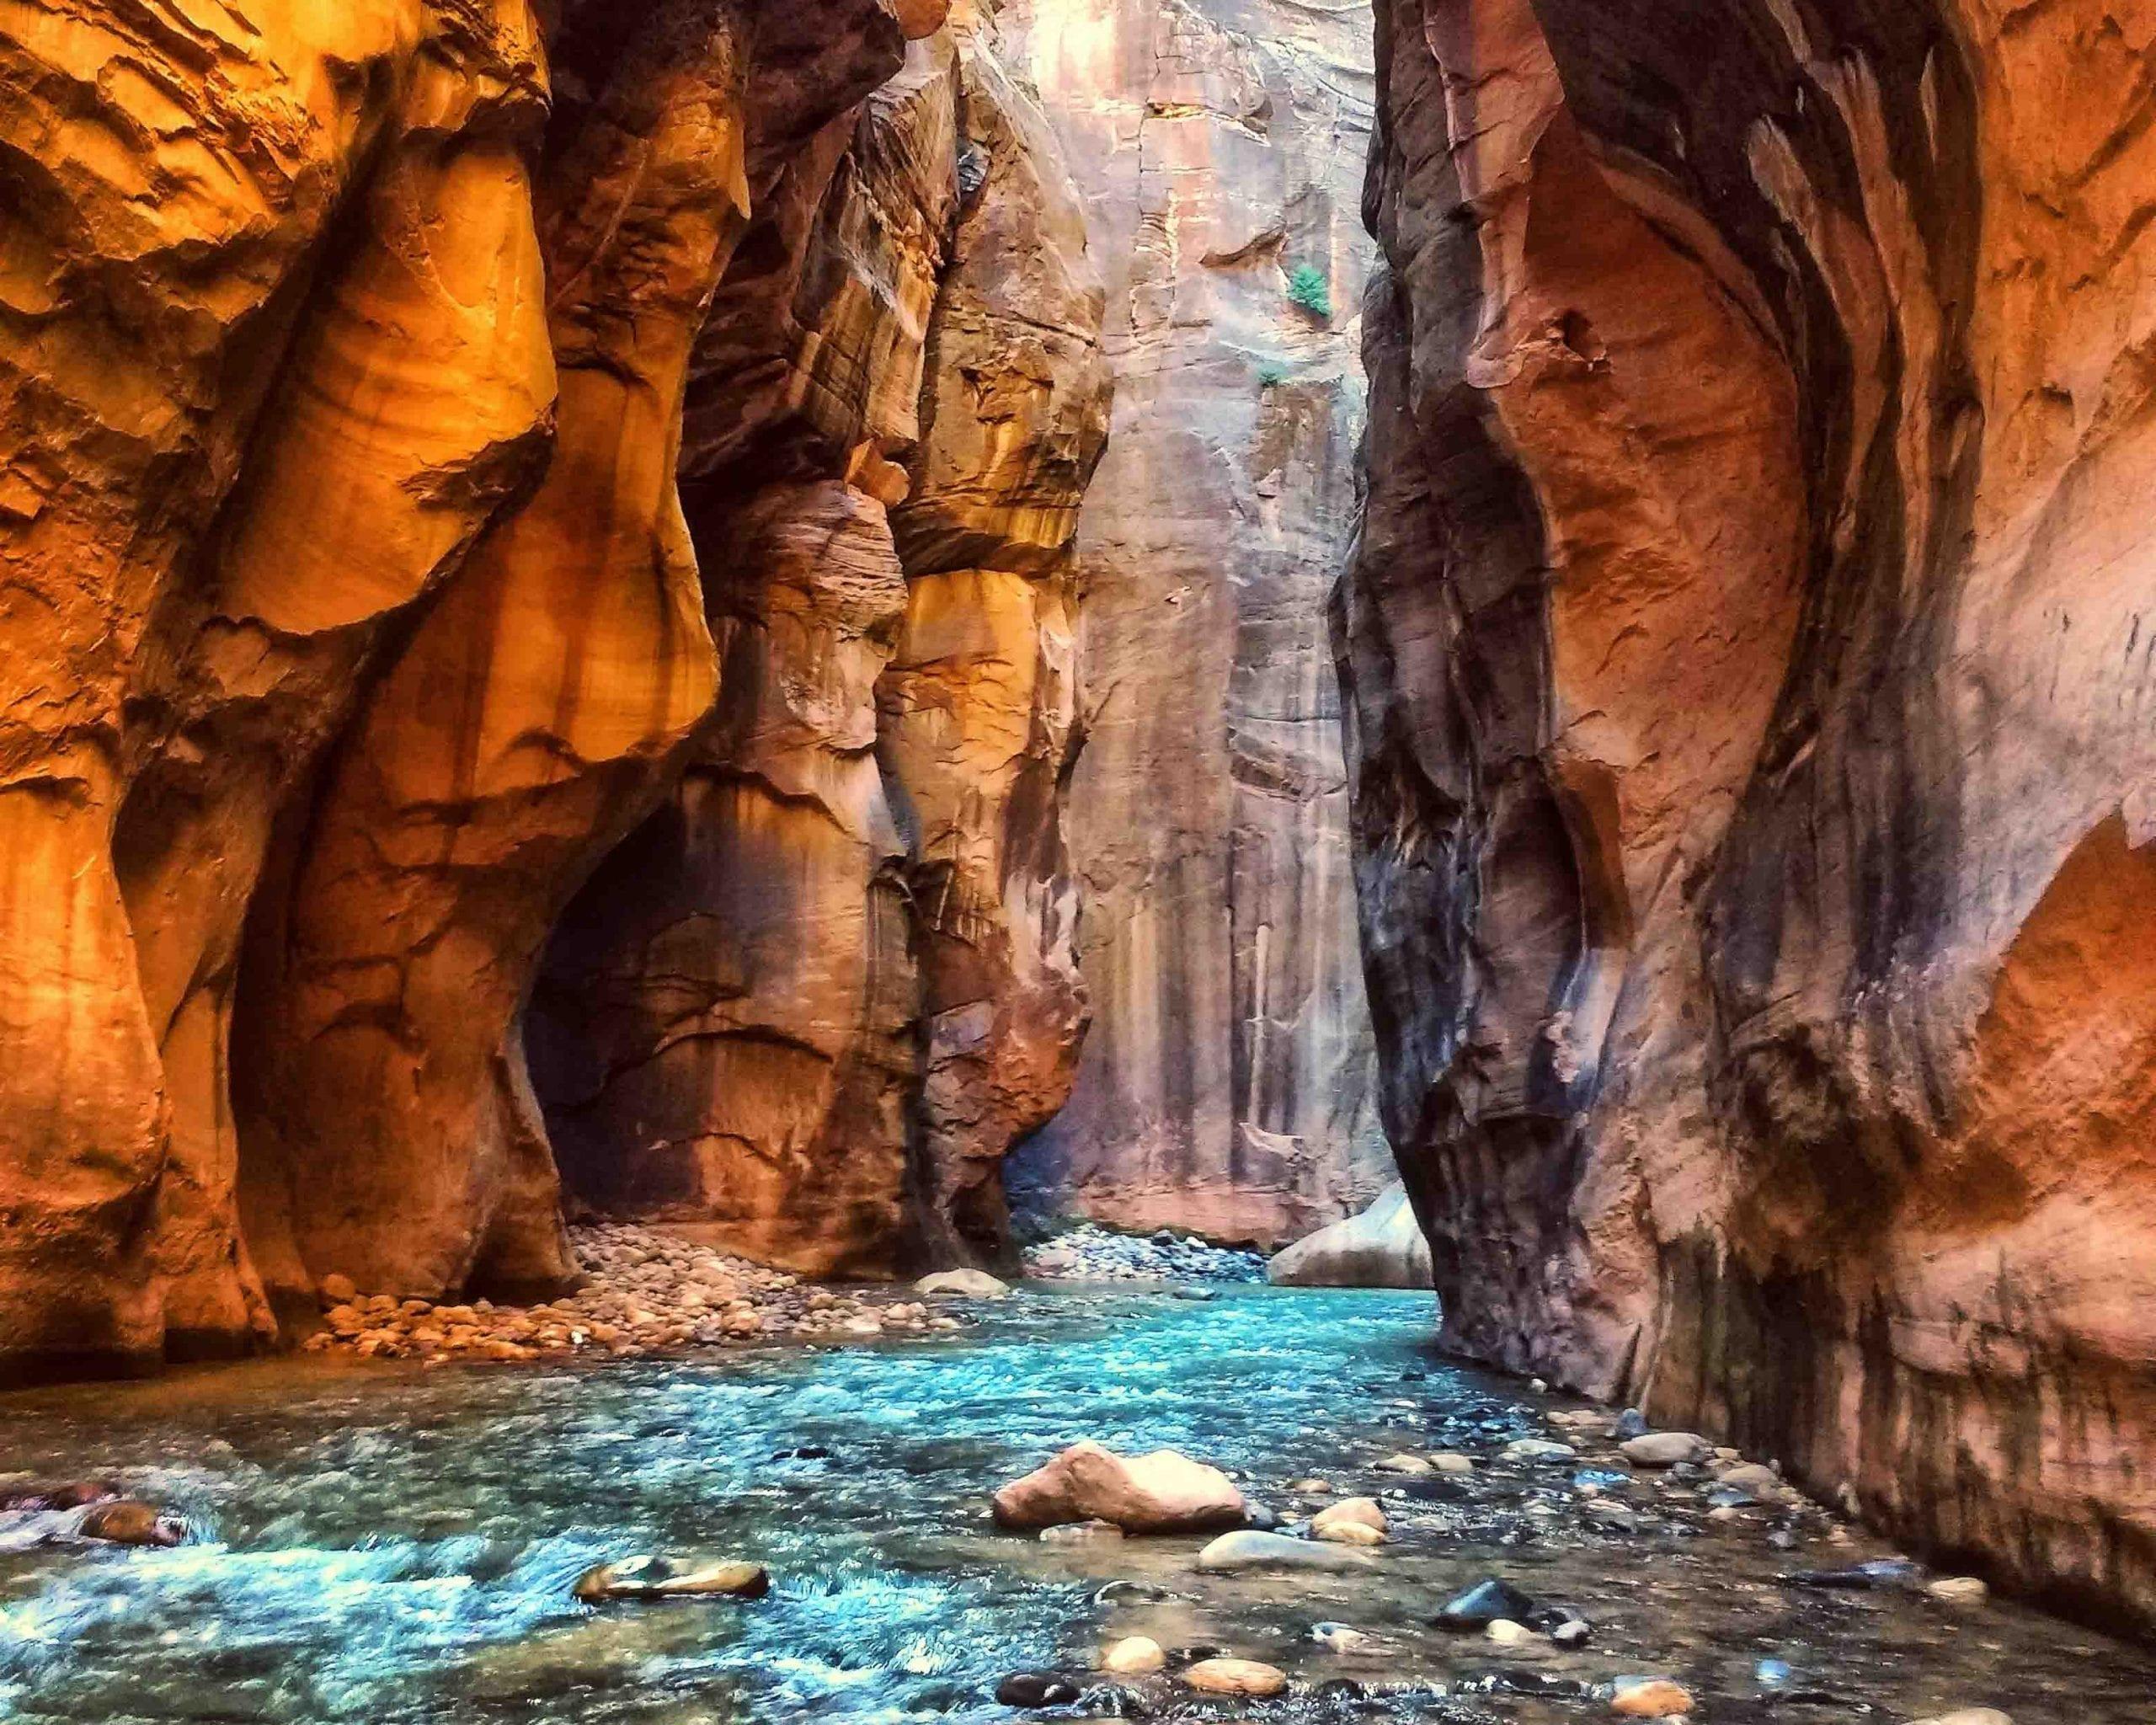 31 Fun St George Date Ideas: Romantic Things to do in St George Utah